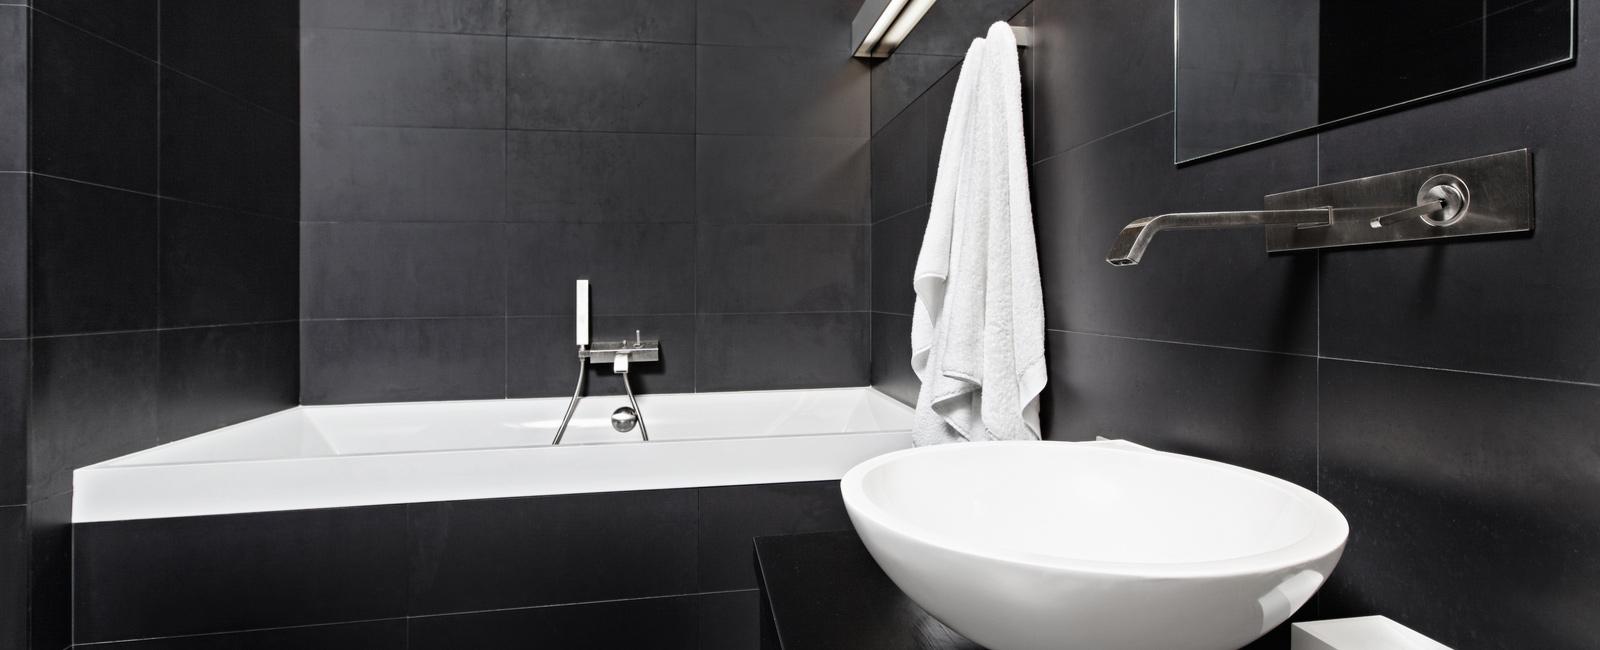 salle de bain monochrome